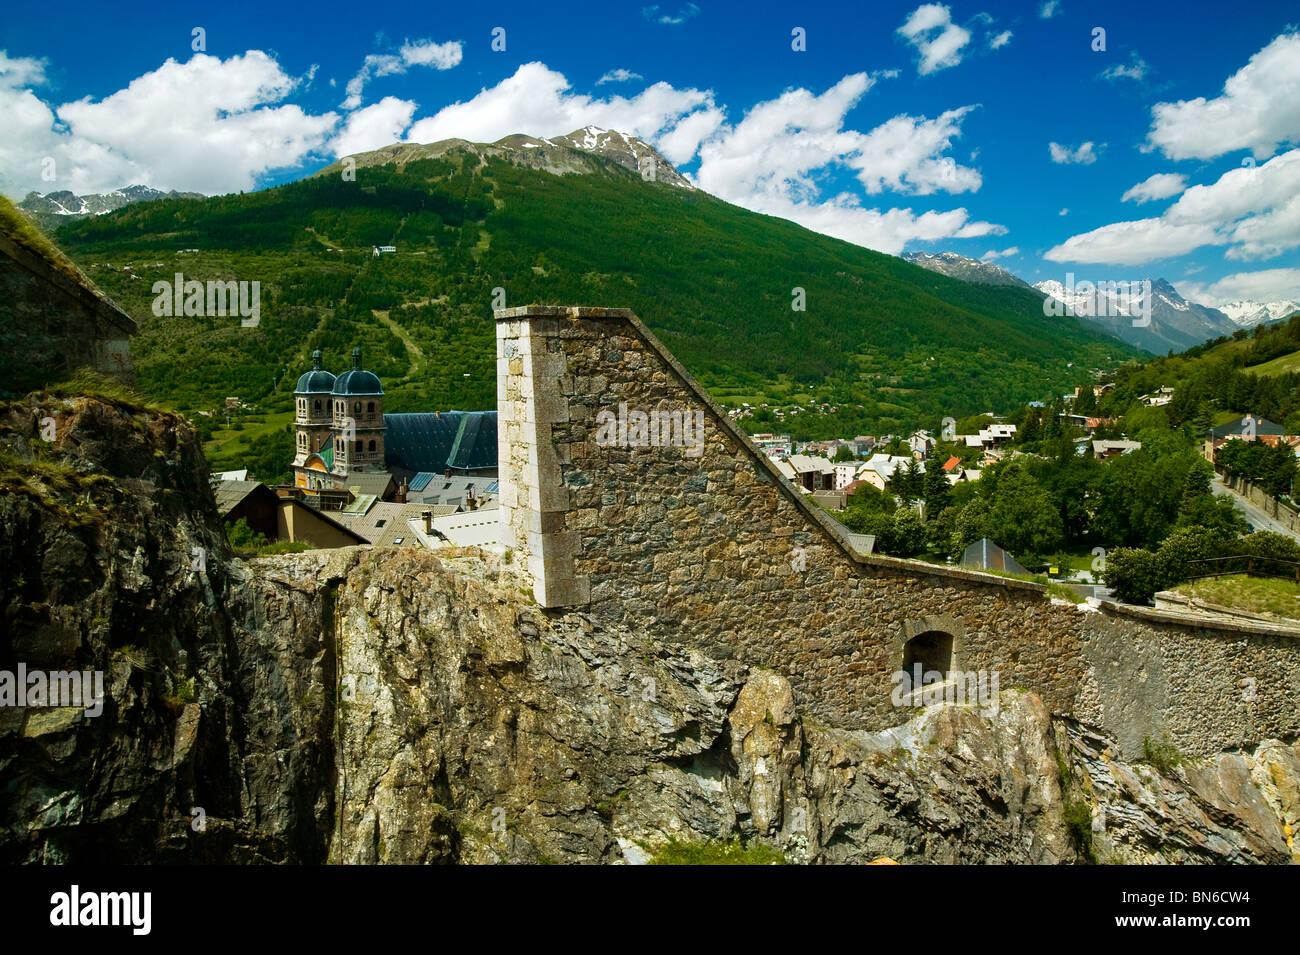 BRIANCON, HAUTES-ALPES, PACA, FRANCE - Stock Image